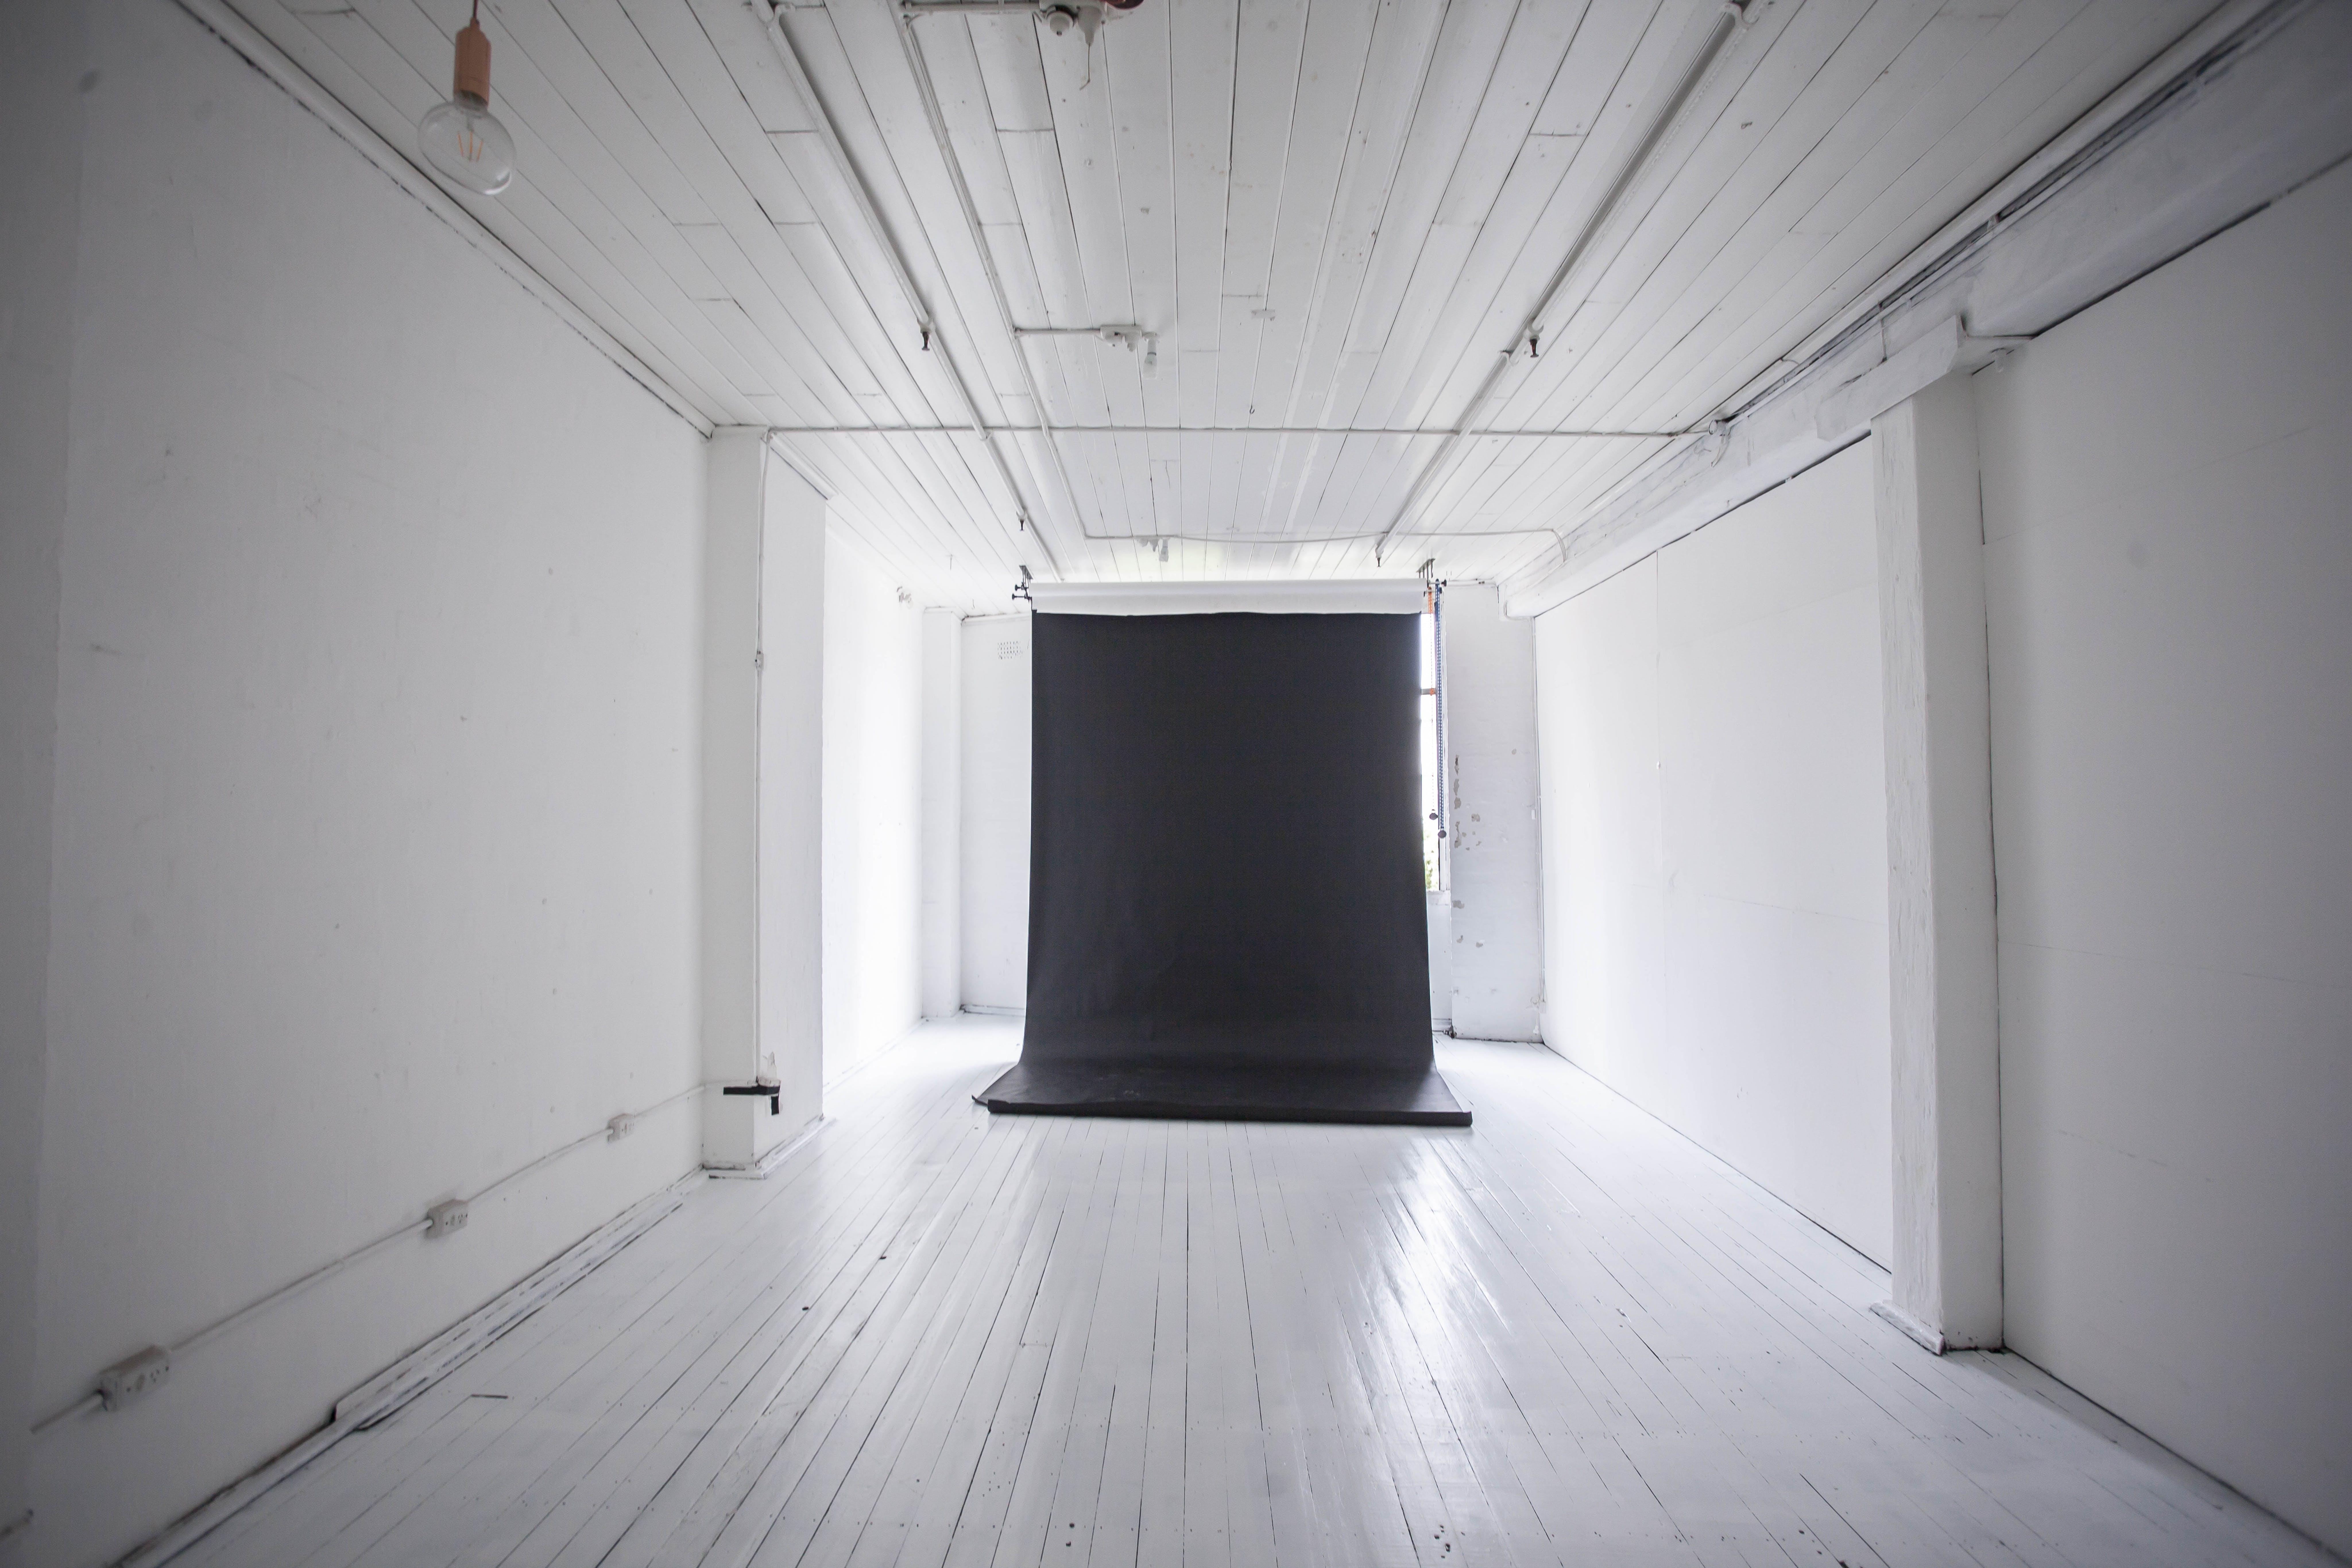 Photography Studio - The White room, creative studio at Studio Blueprint Photography Studio, image 3